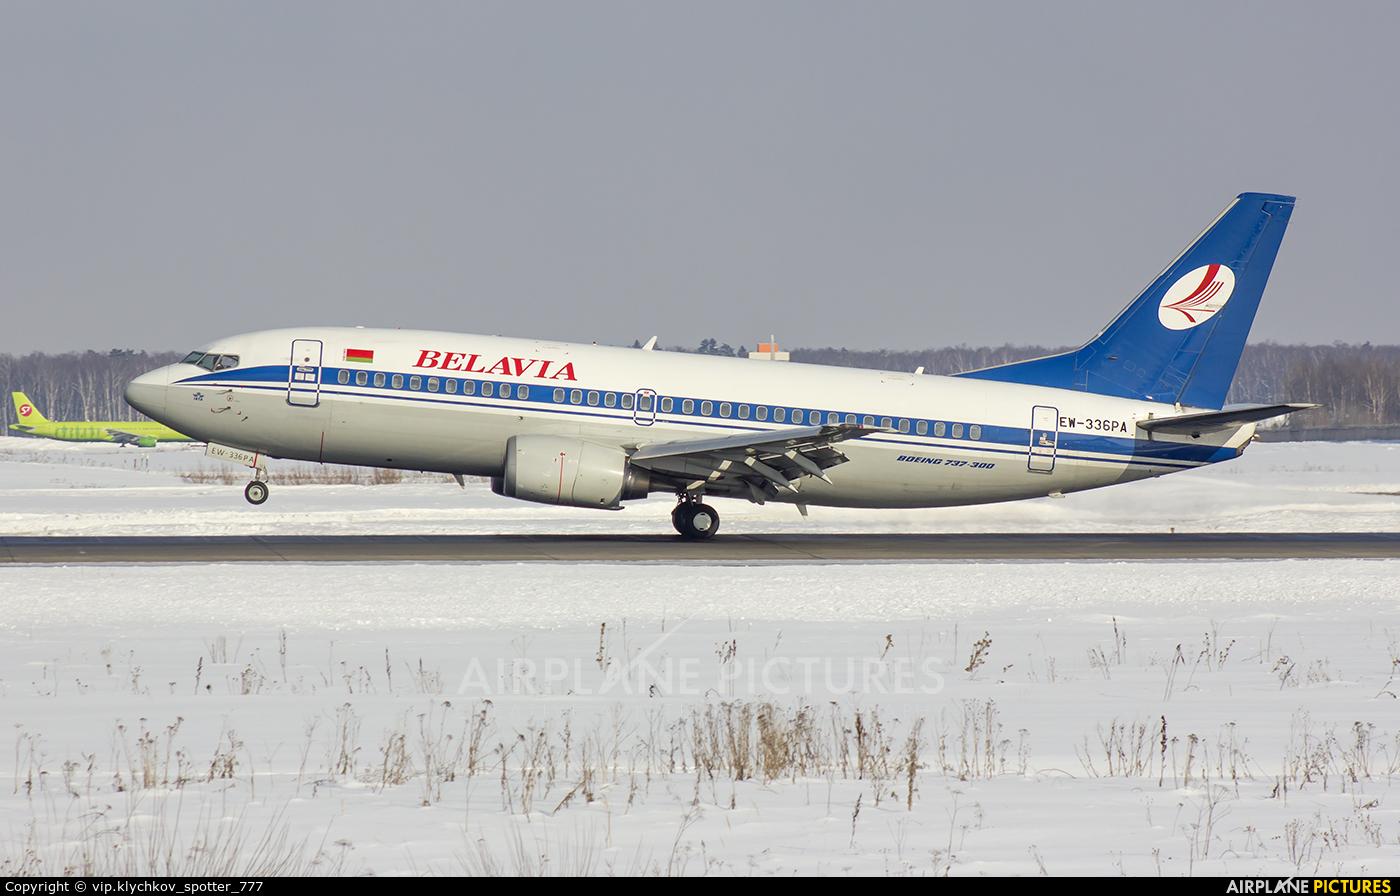 Belavia EW-336PA aircraft at Moscow - Domodedovo